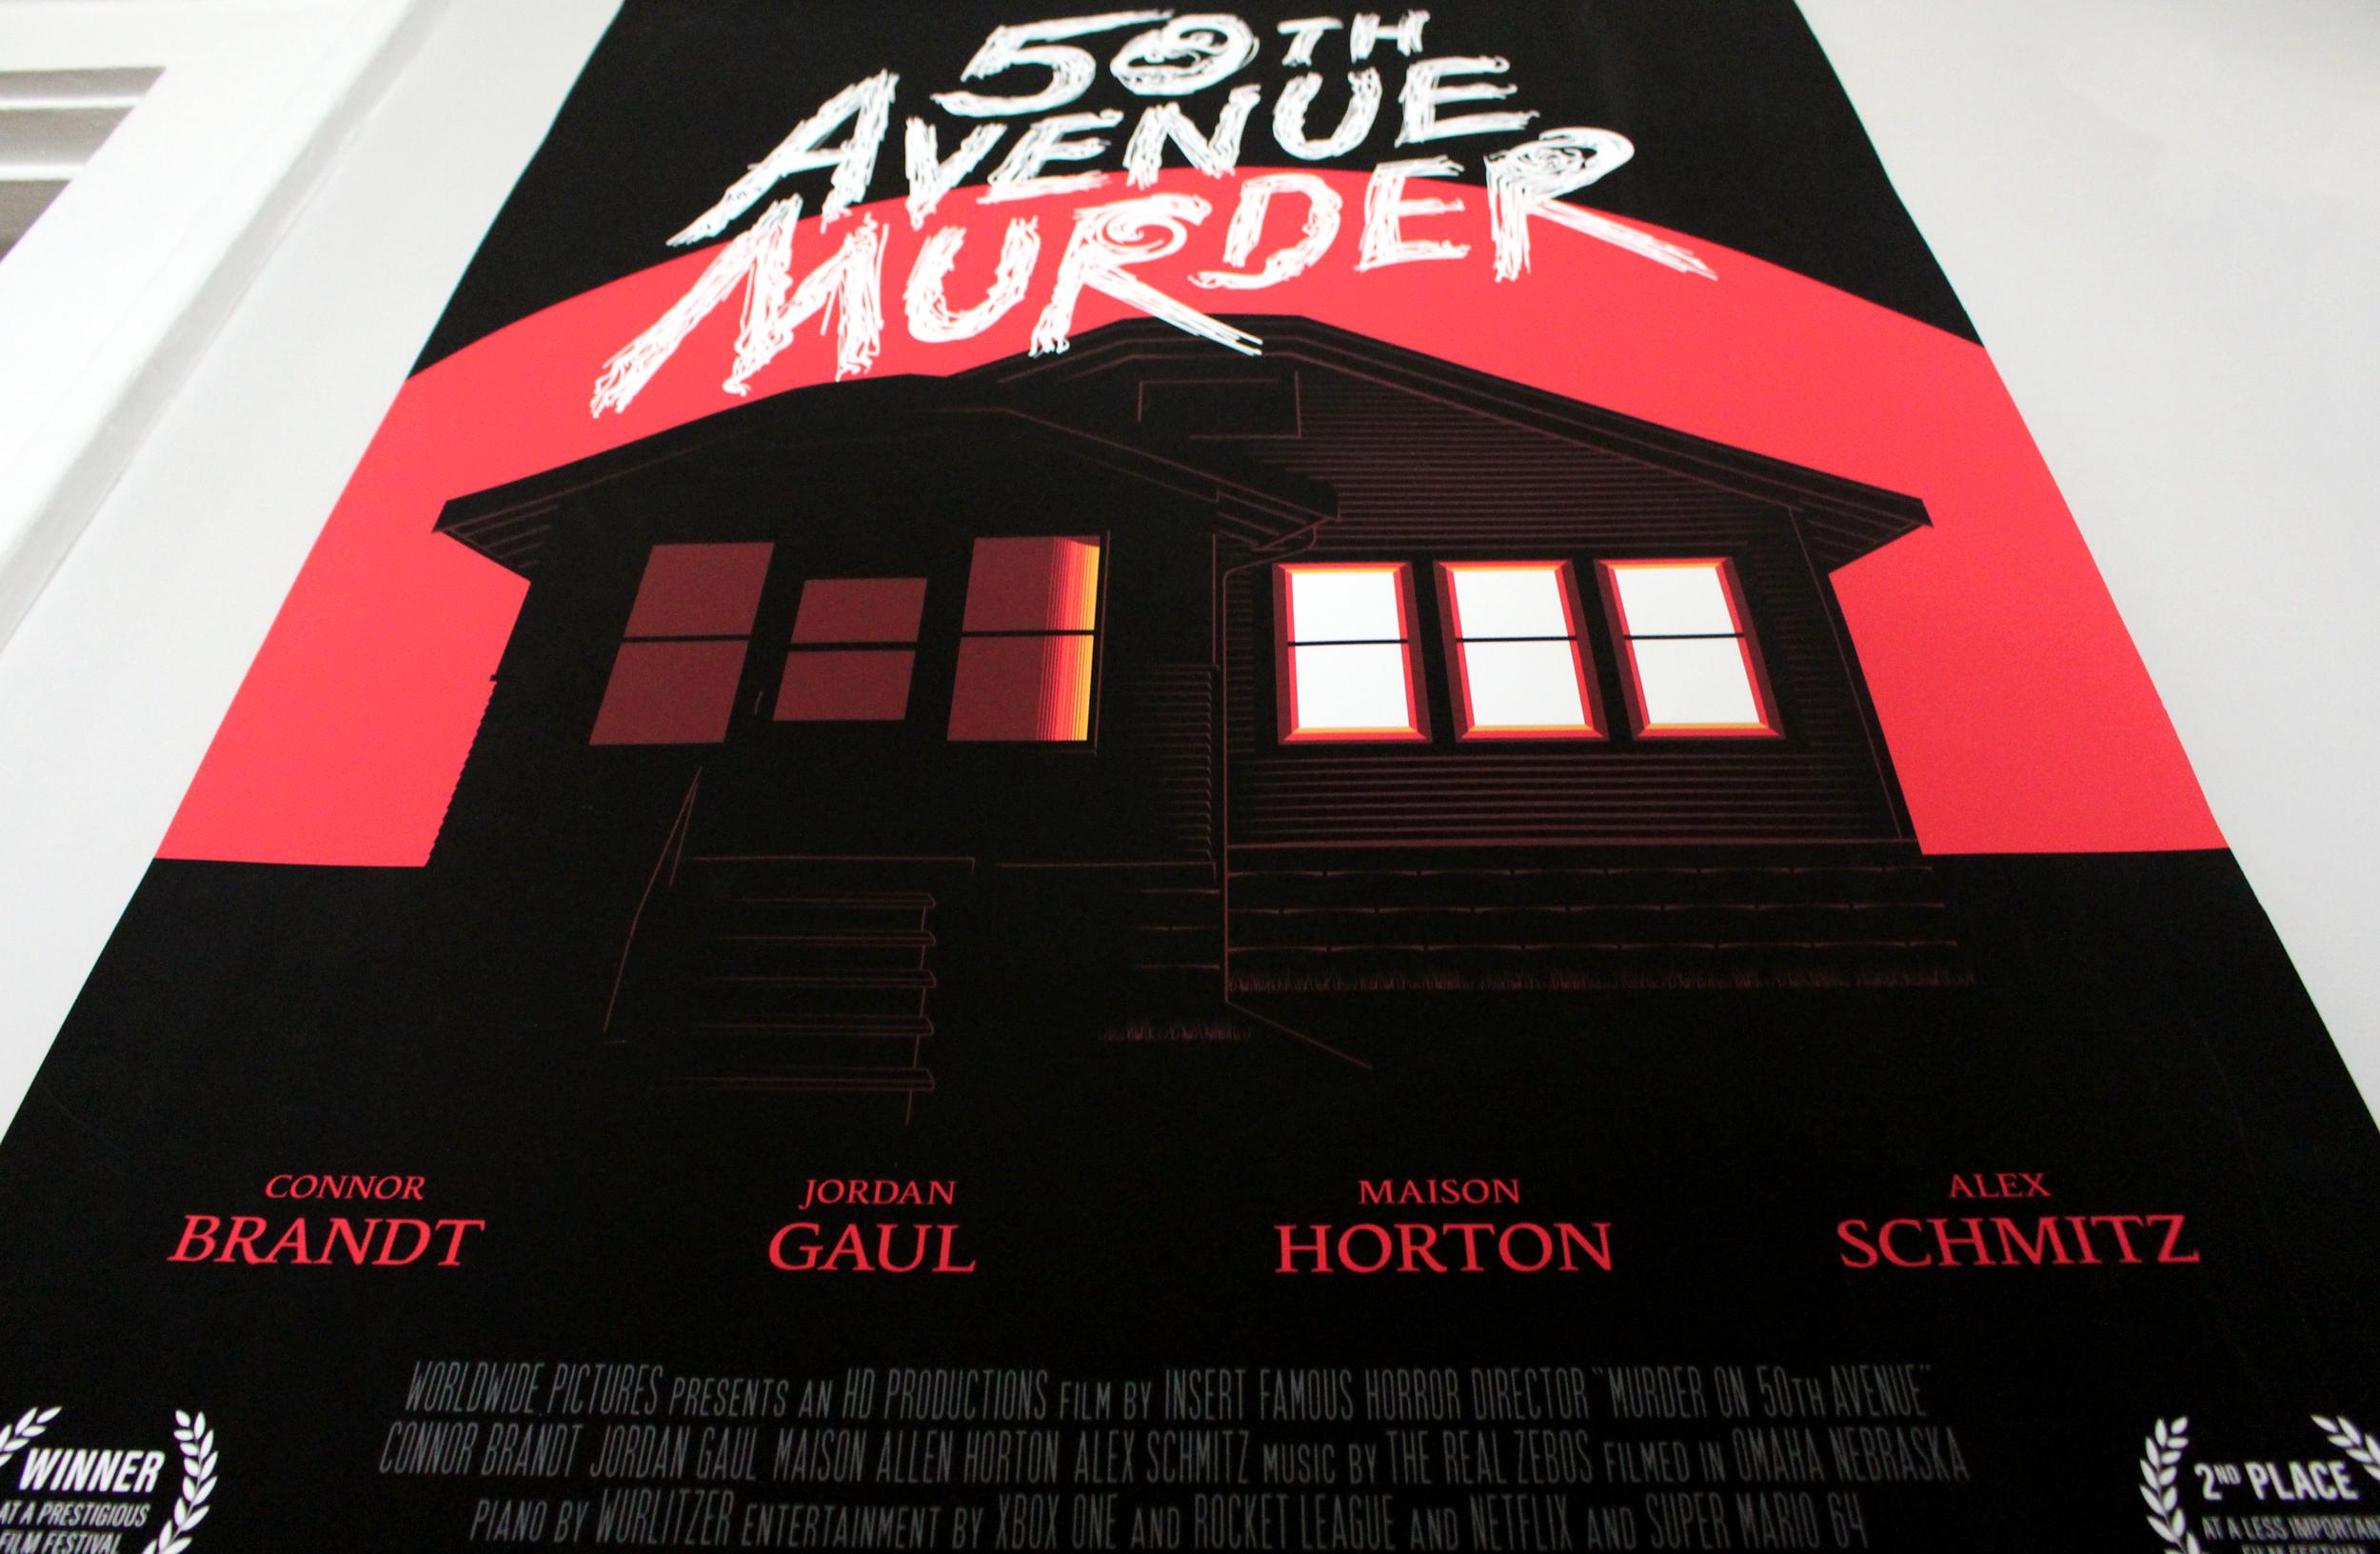 50th Avenue Murder